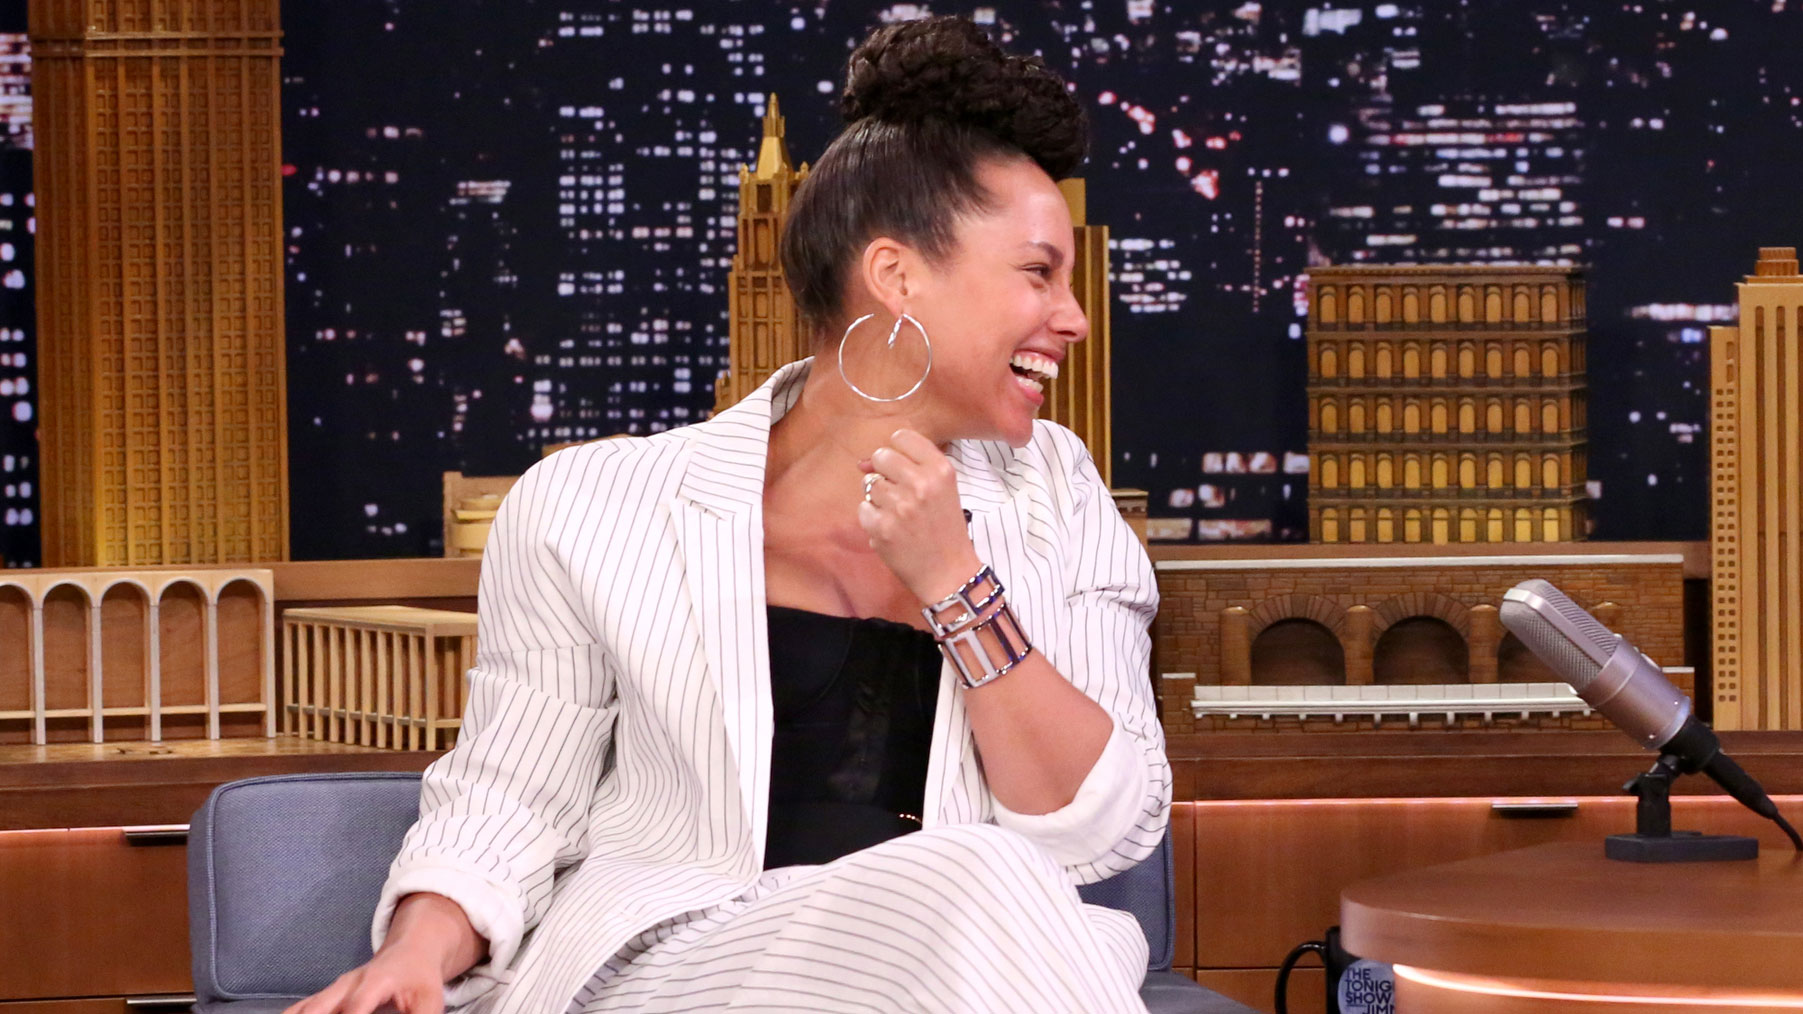 Alicia Keys' Son Produces Beats for Kendrick Lamar - The Tonight Show Nbc